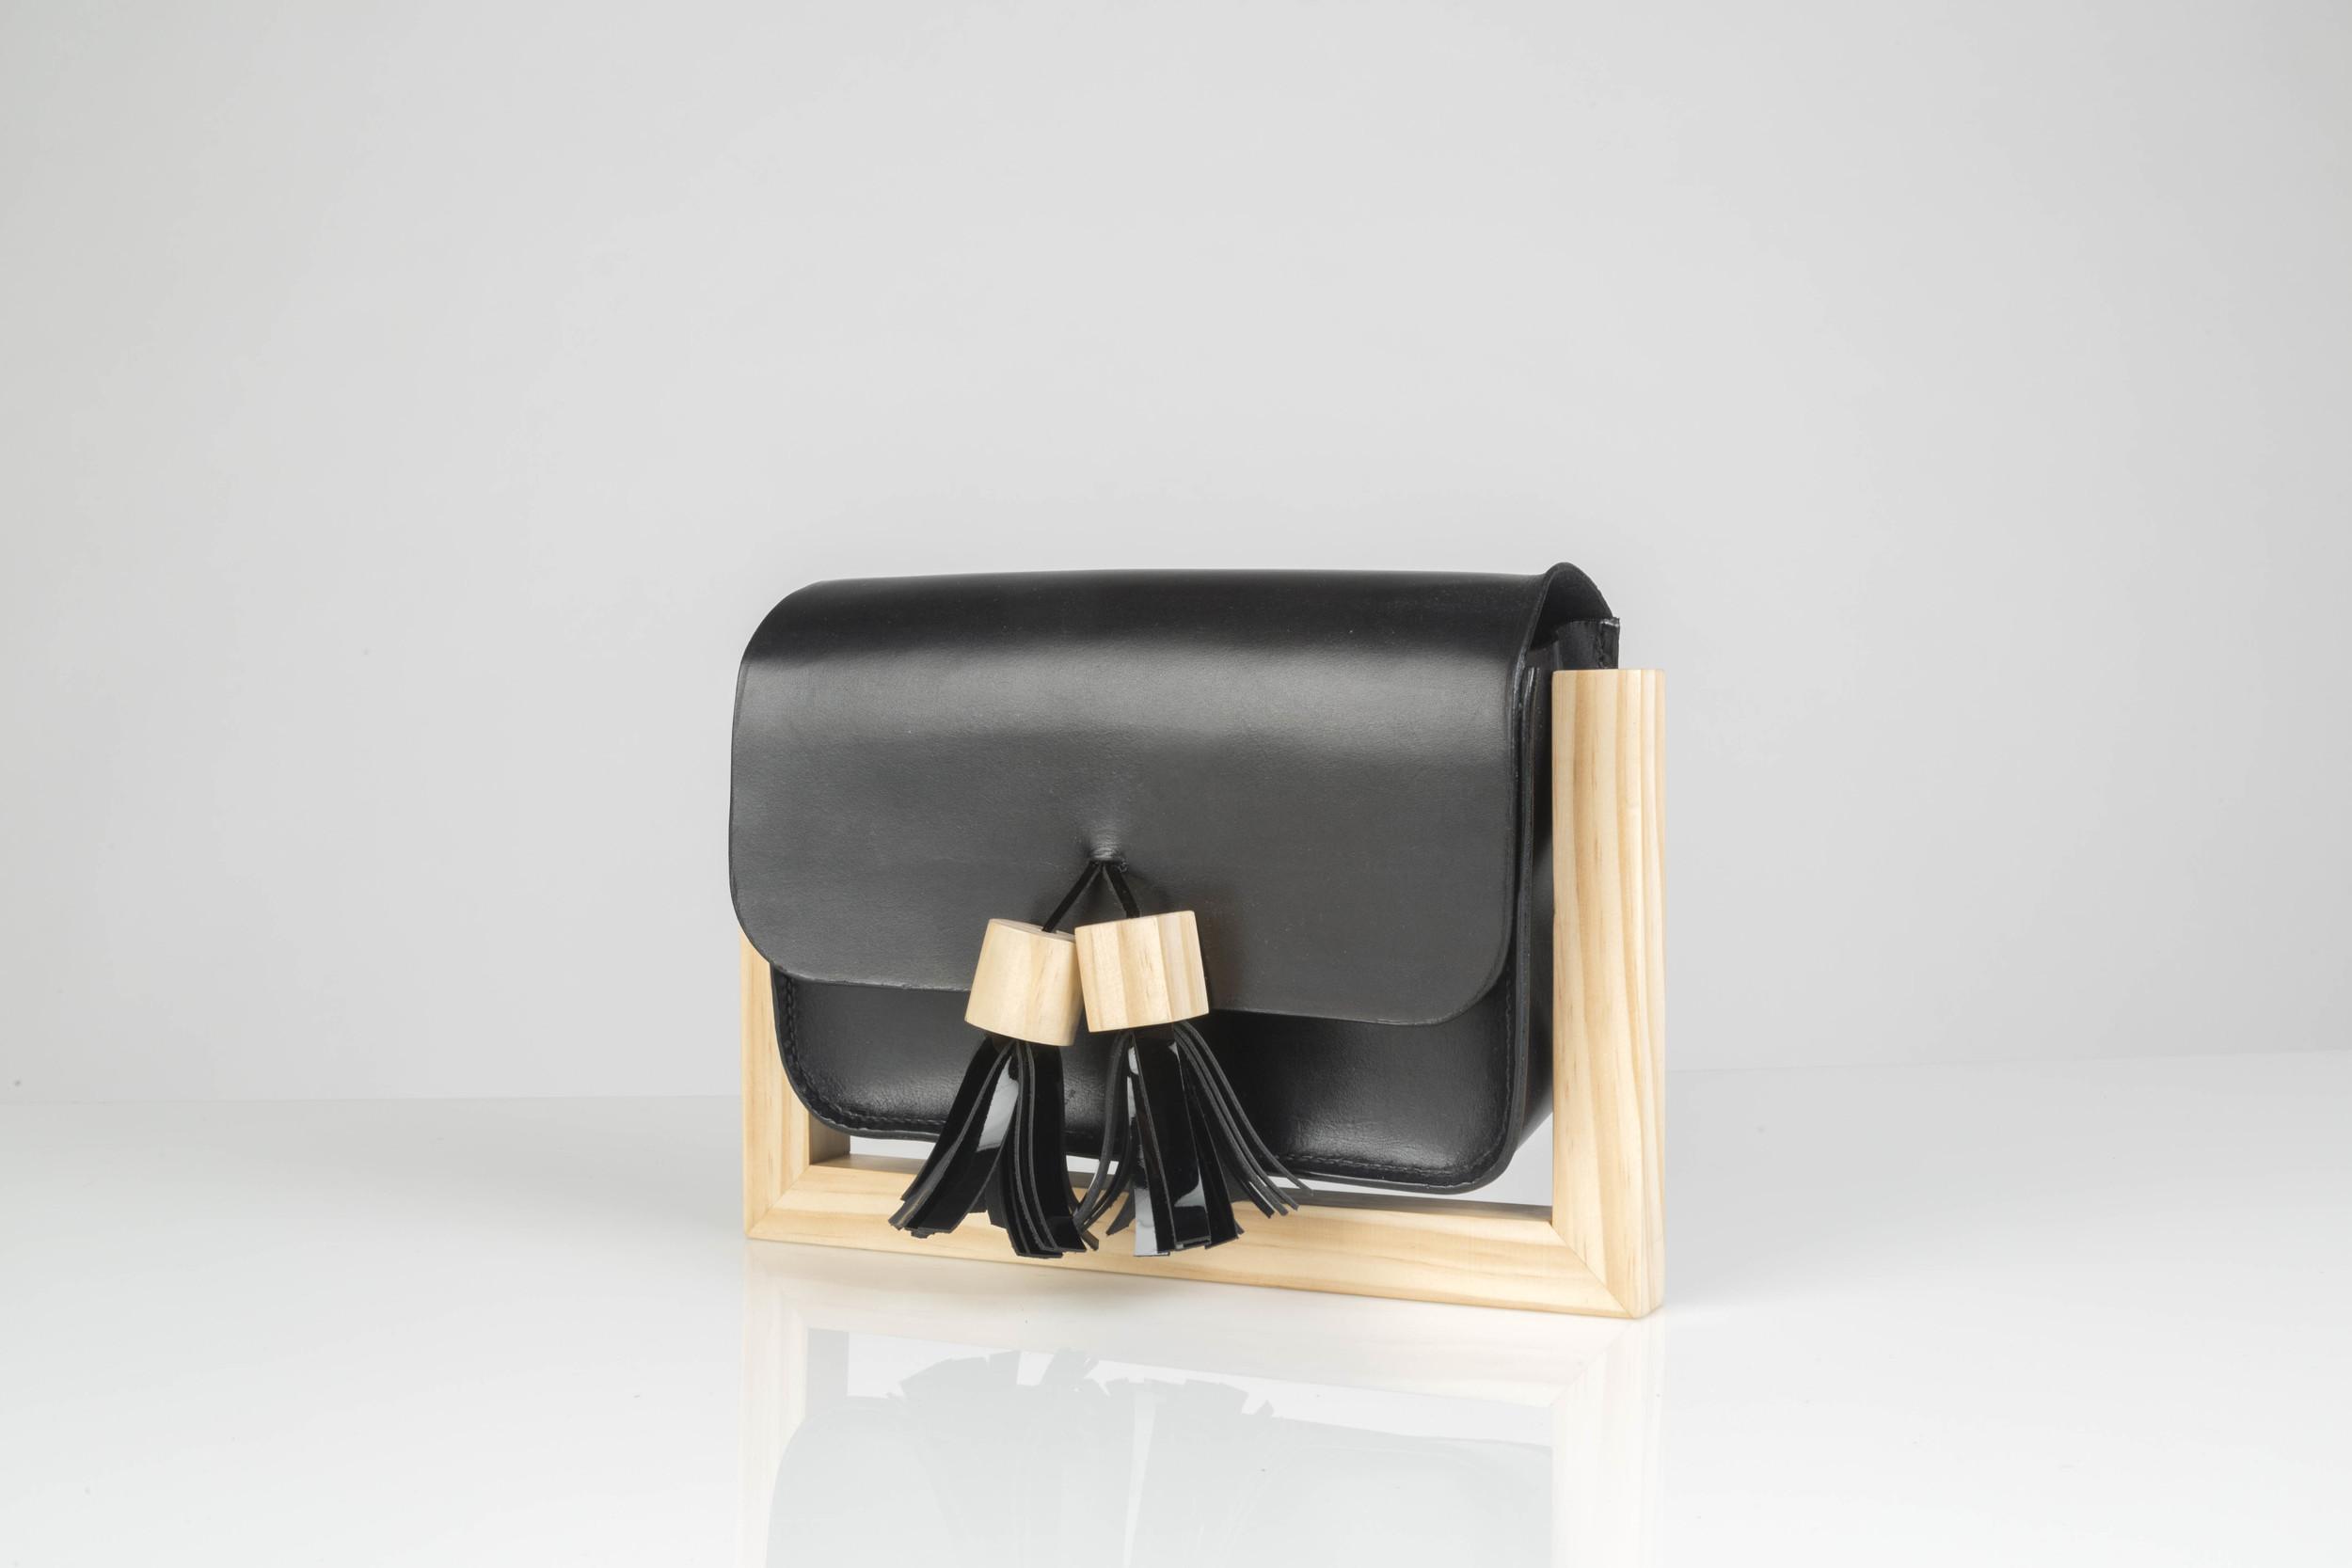 LITERALLYHandbags-5.jpg